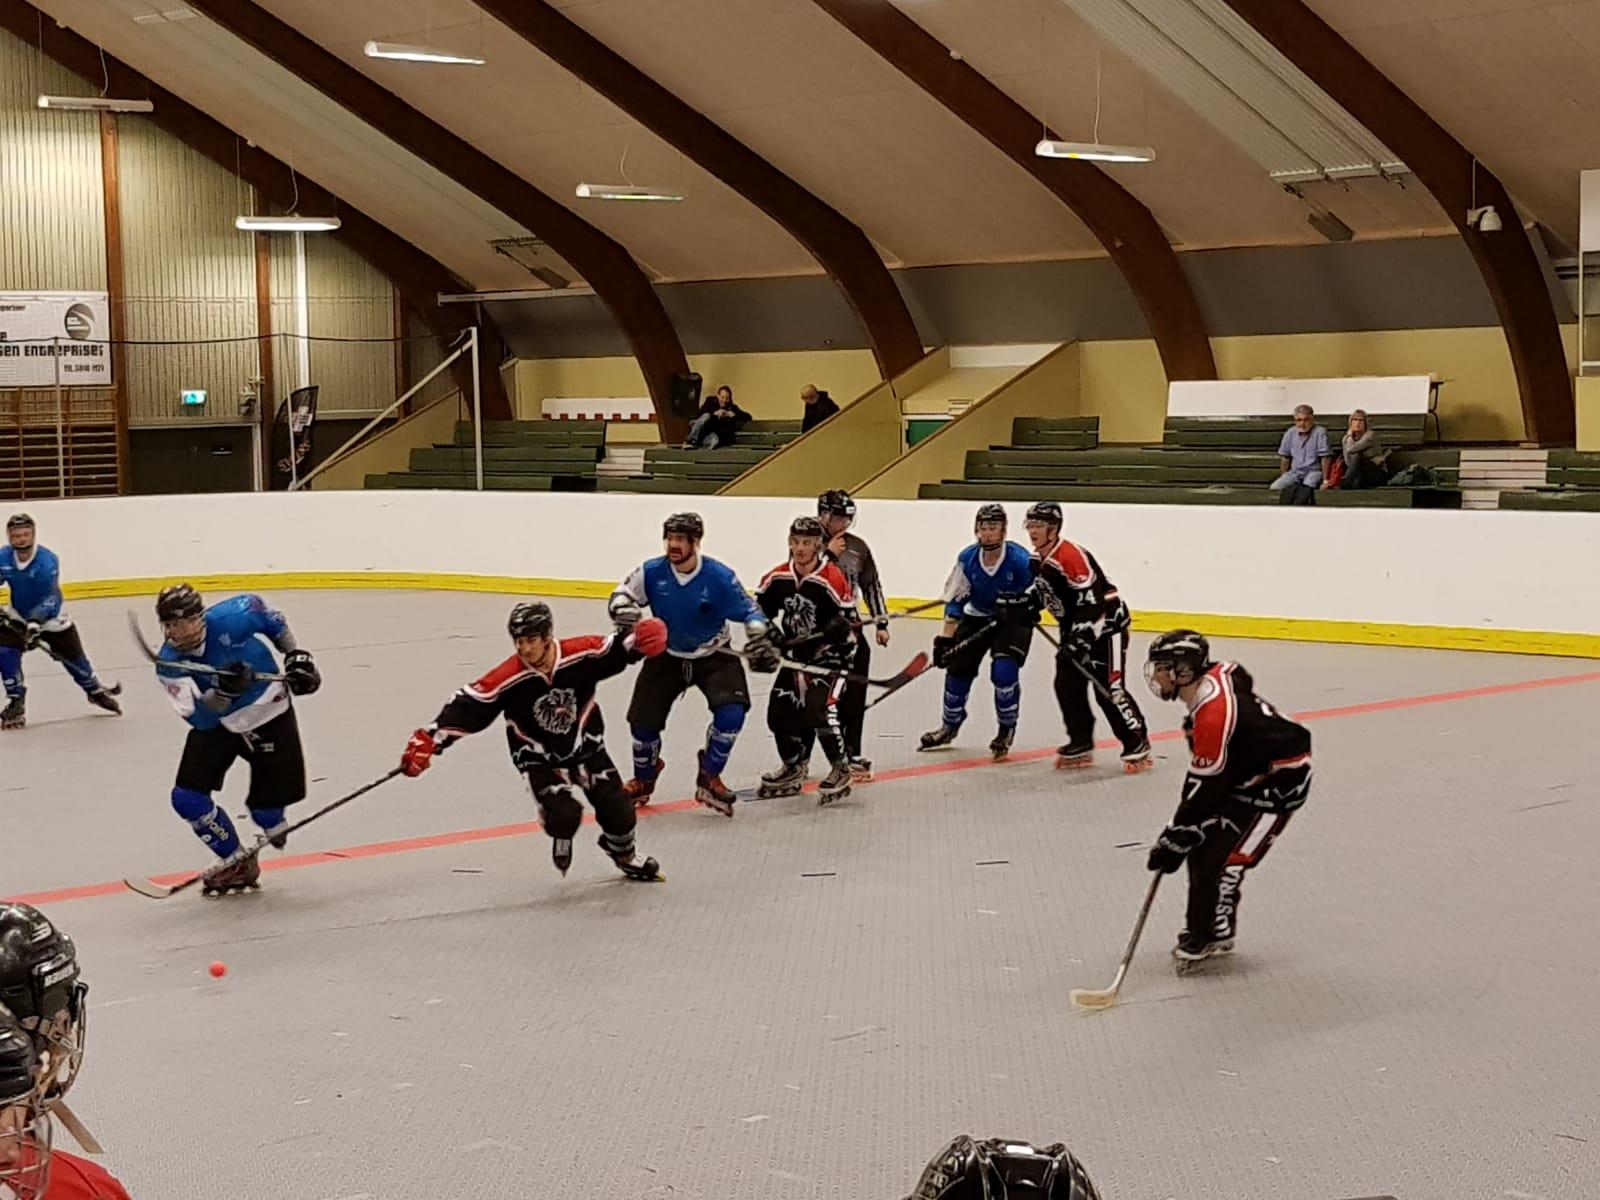 Spielplan U19 IISHF Inline-Skaterhockey Europameisterschaft 2019 Spielplan